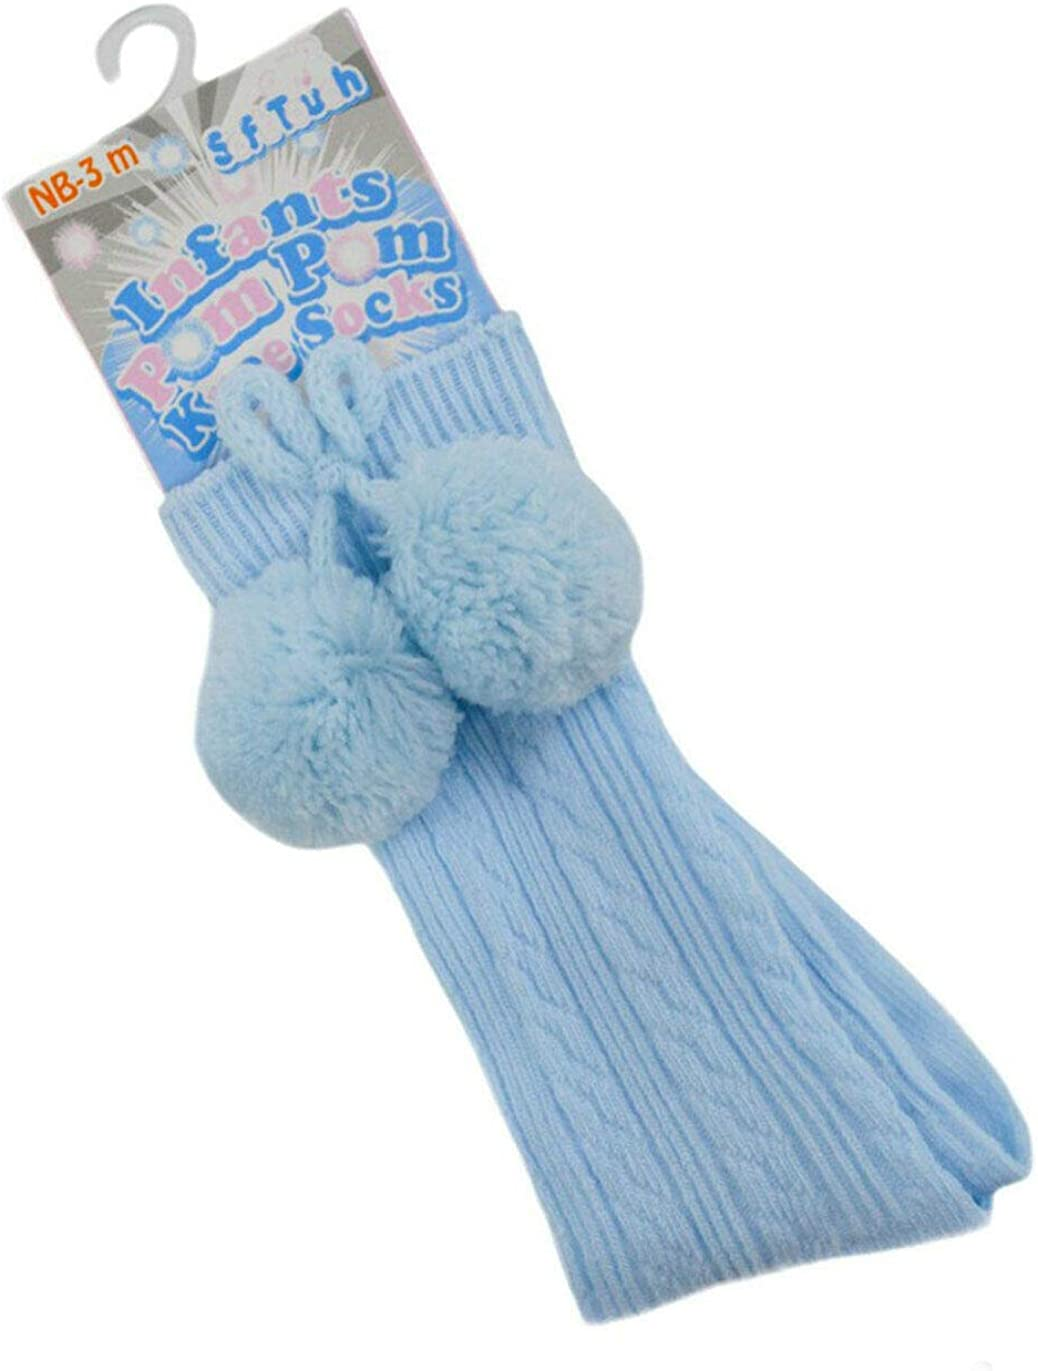 Baby Boys Girls 1 Pair Pom Pom Socks Spanish Romany Style Knee Length Stretch Socks Nb To 12 Months S47